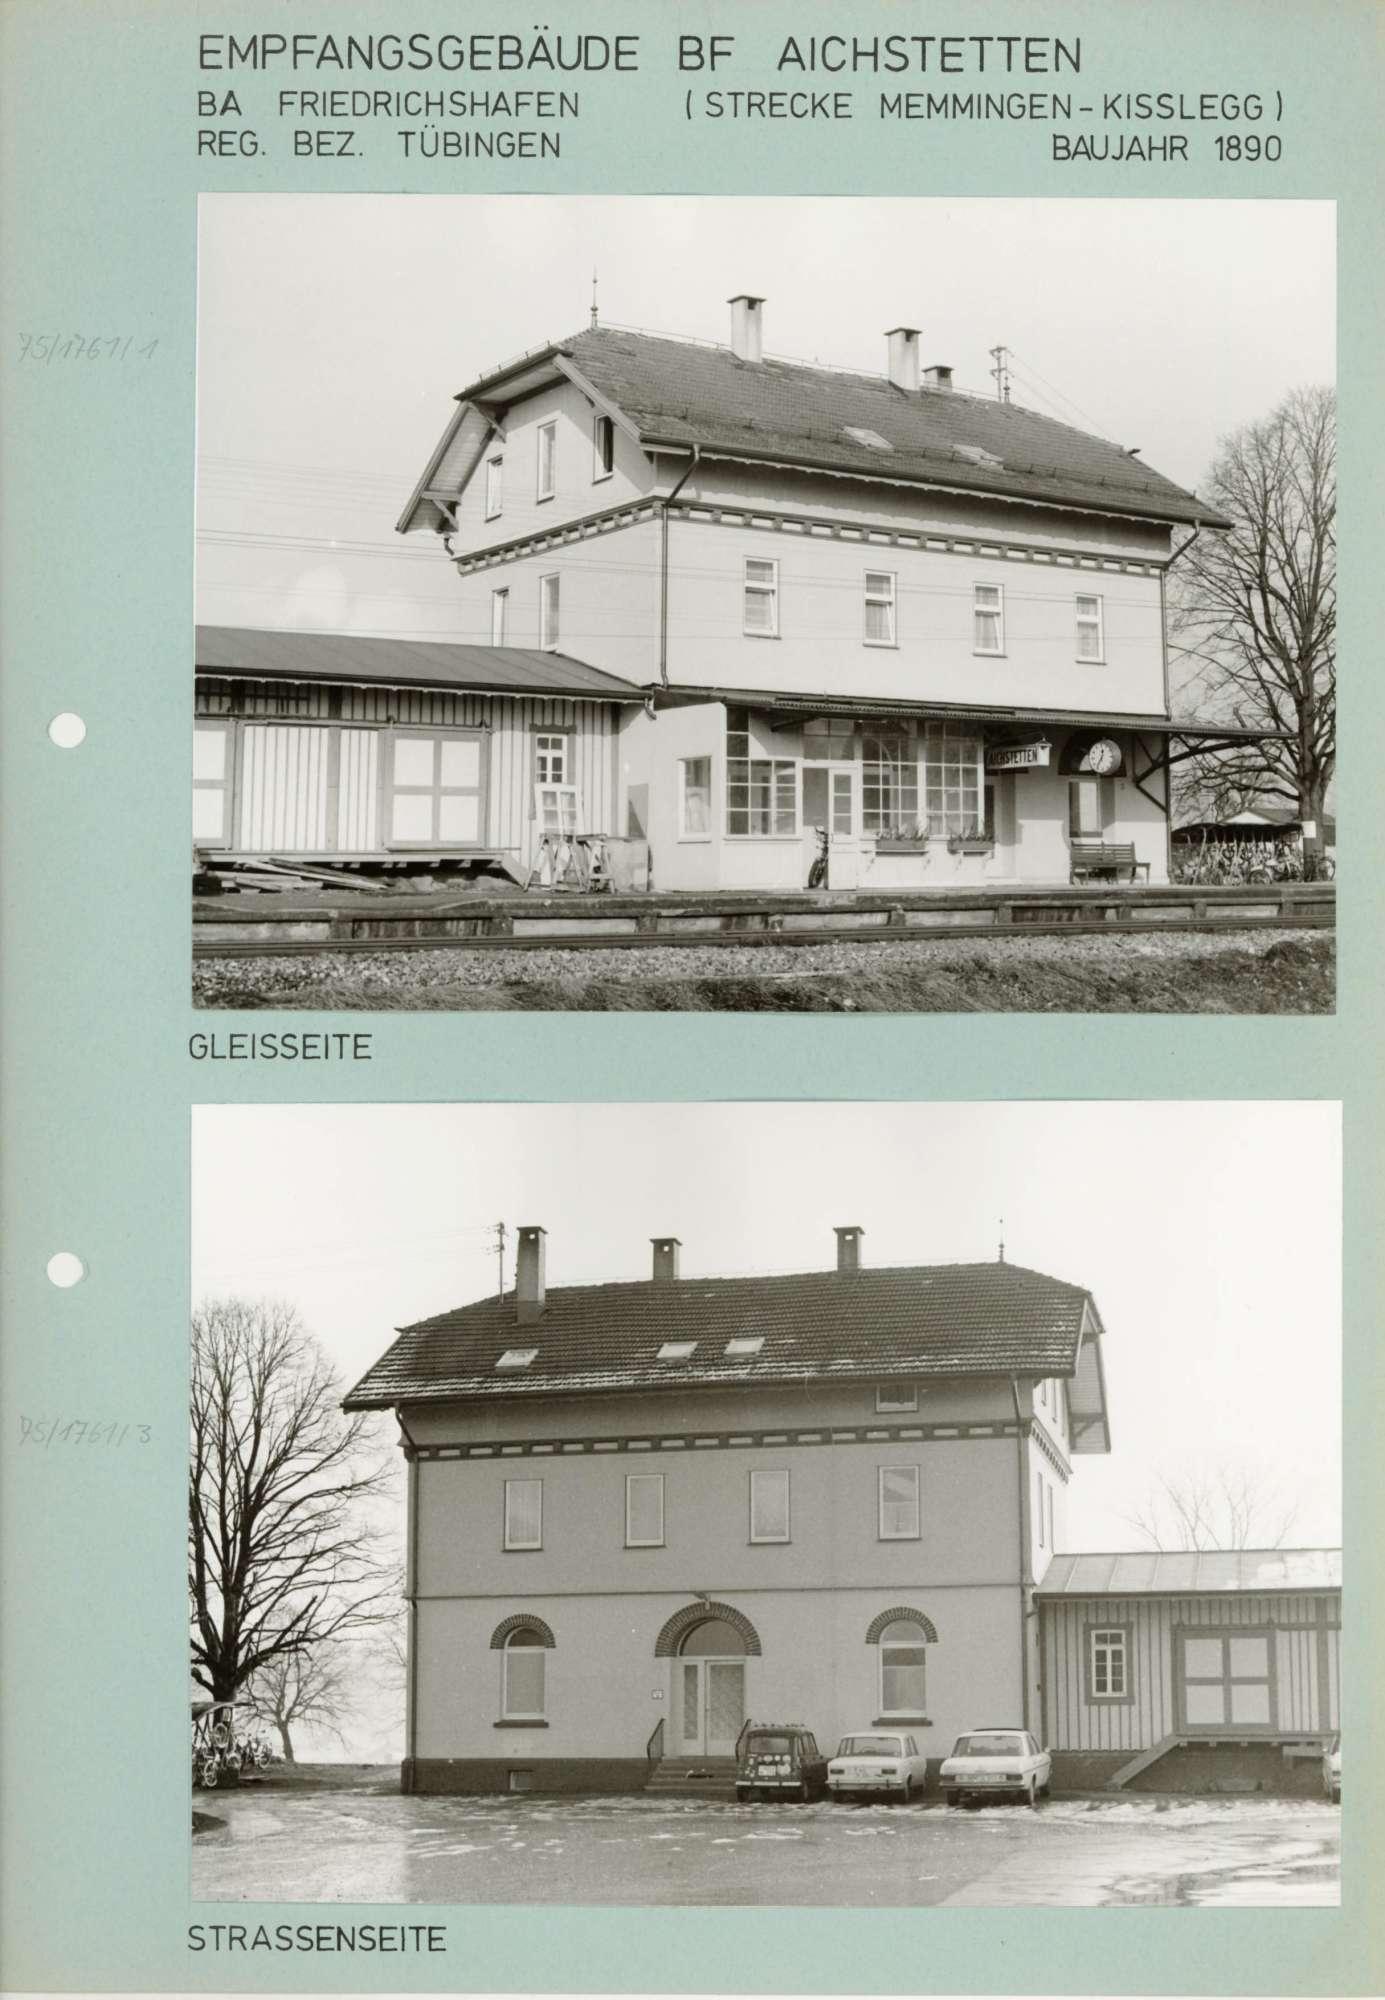 Aichstetten: 4 Fotos, Bild 1